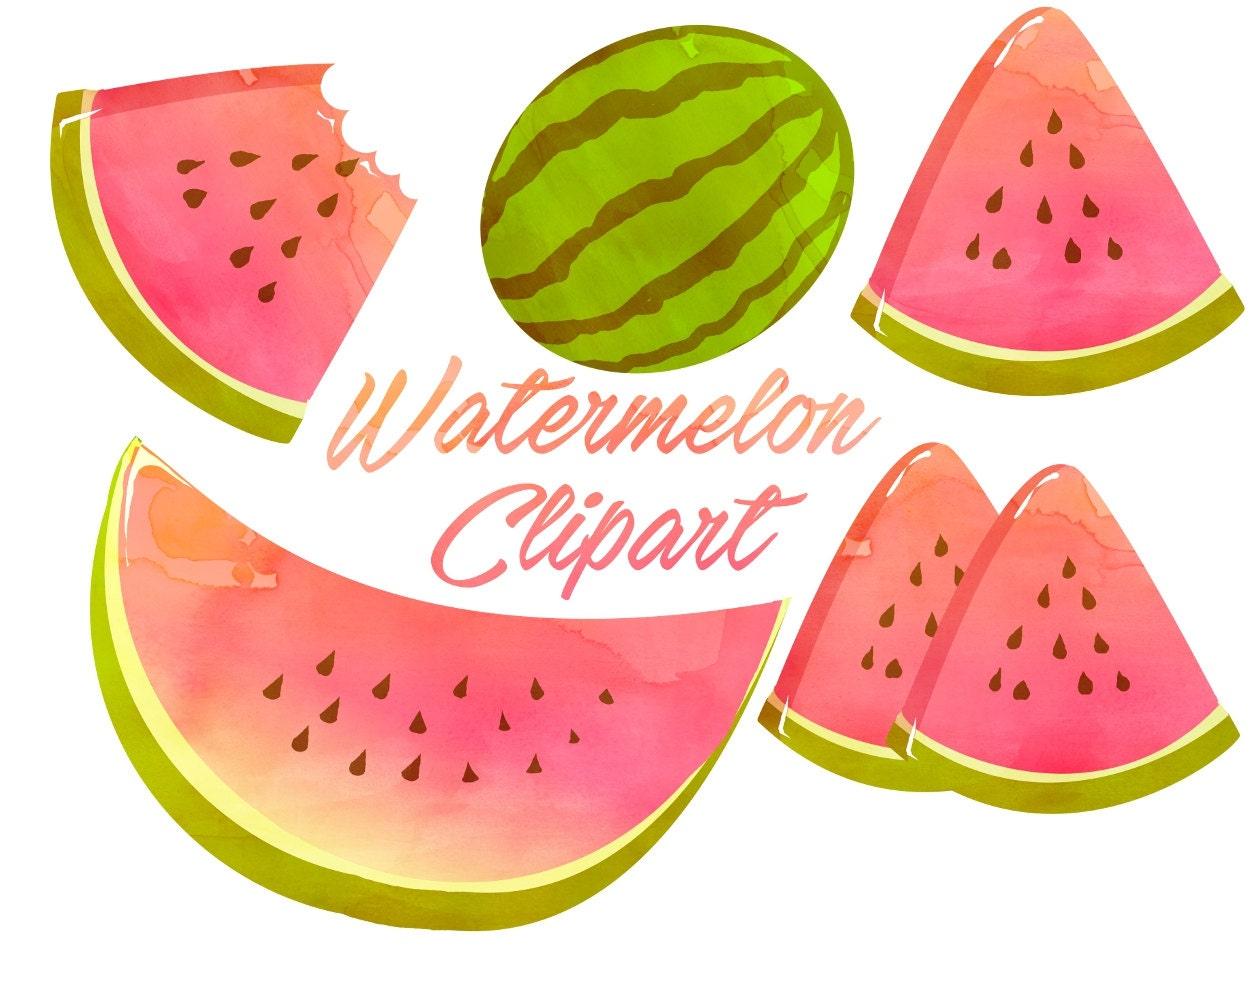 Watermelon clipart Watermelon clip art Watercolor clipart